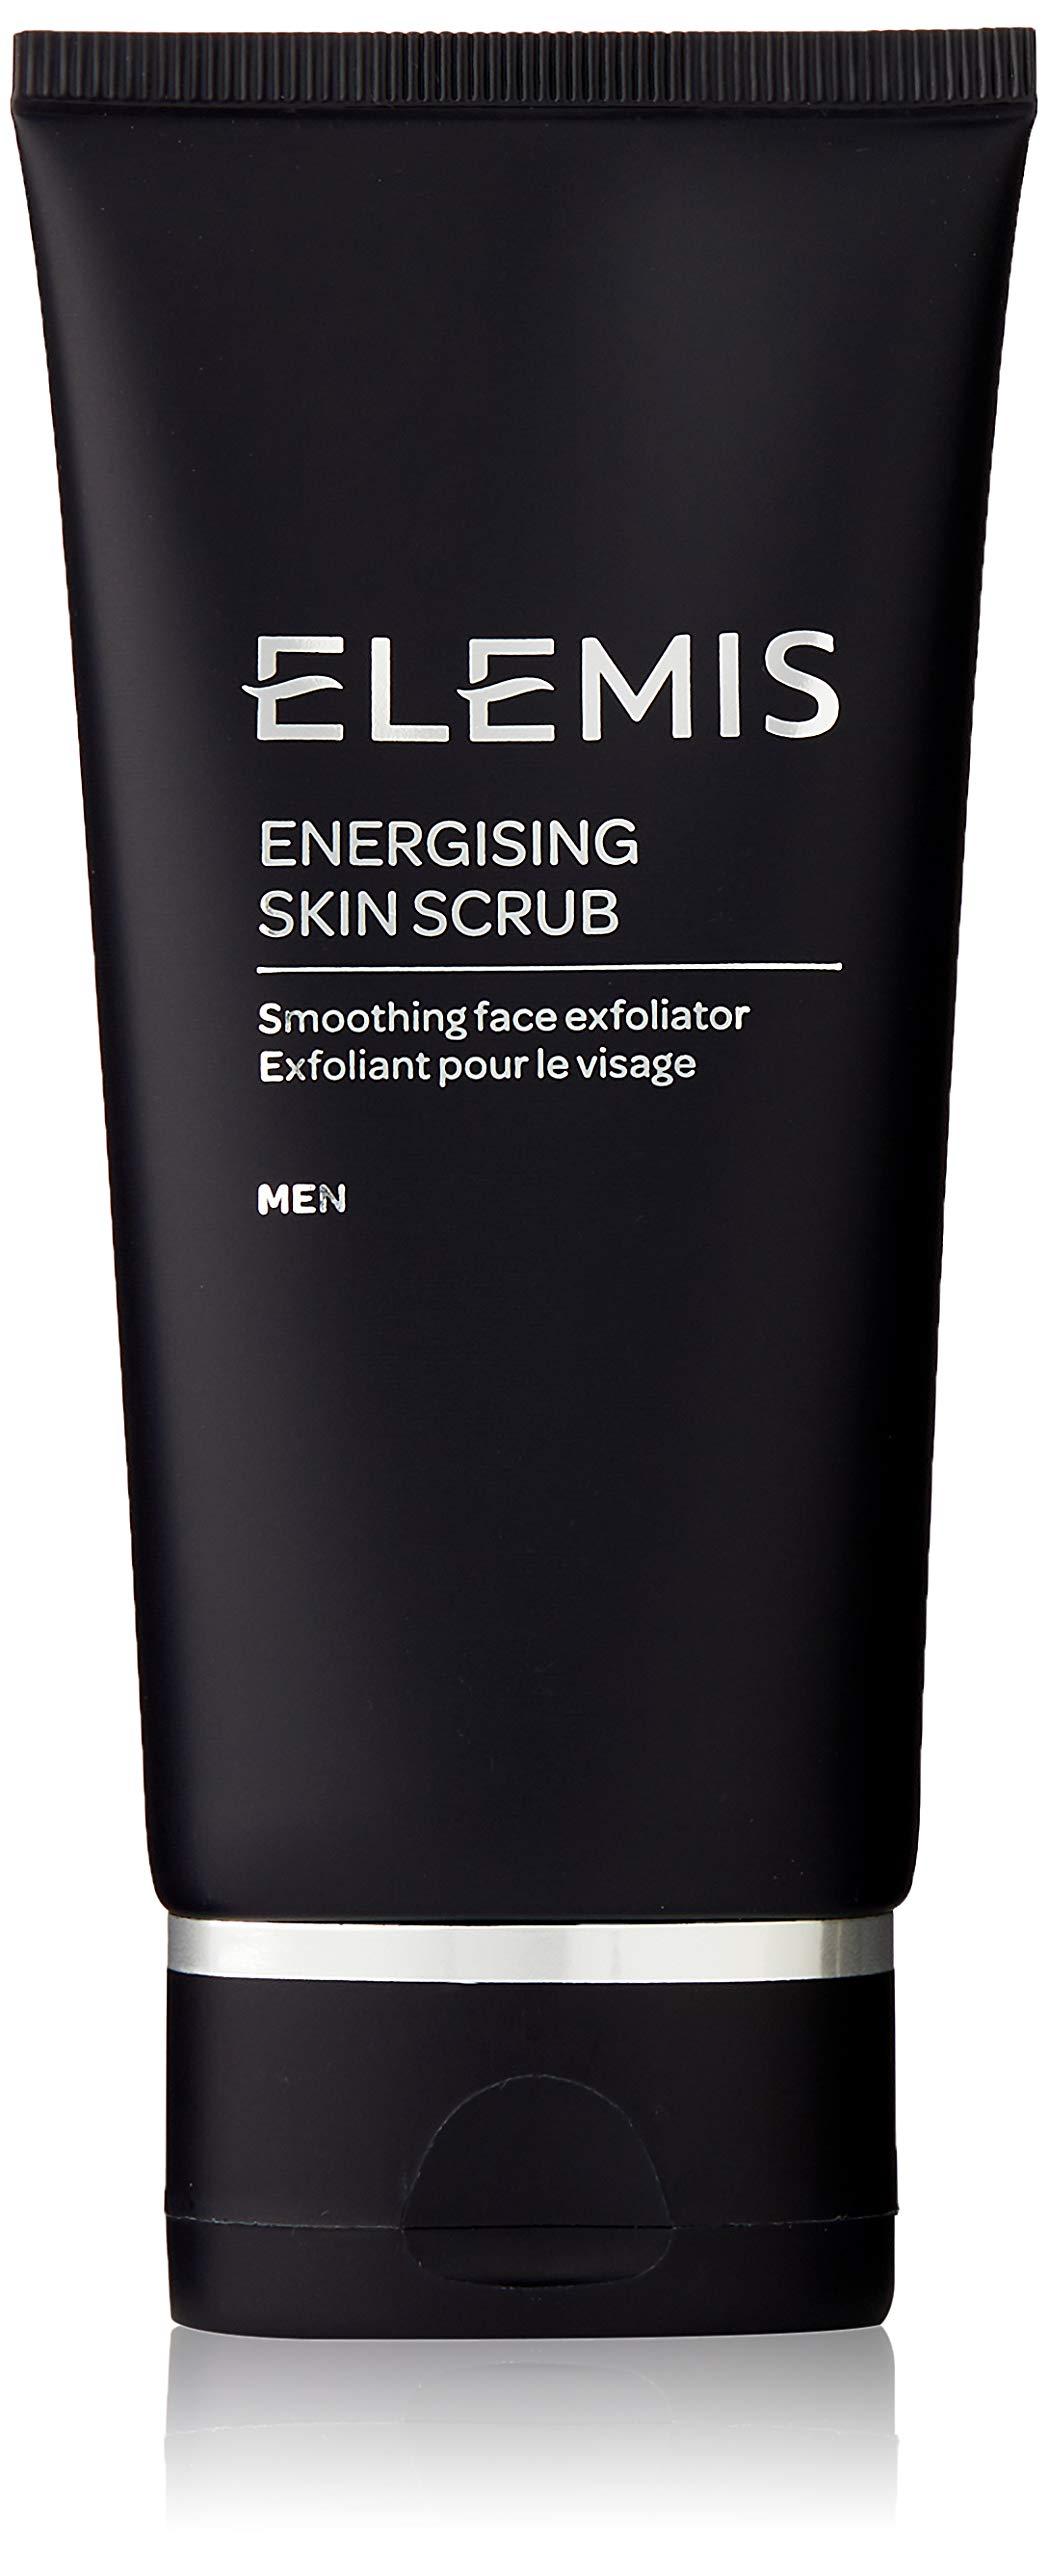 ELEMIS Energising Skin Scrub, Smoothing Face Exfoliator for Men, 2.5 fl oz by ELEMIS